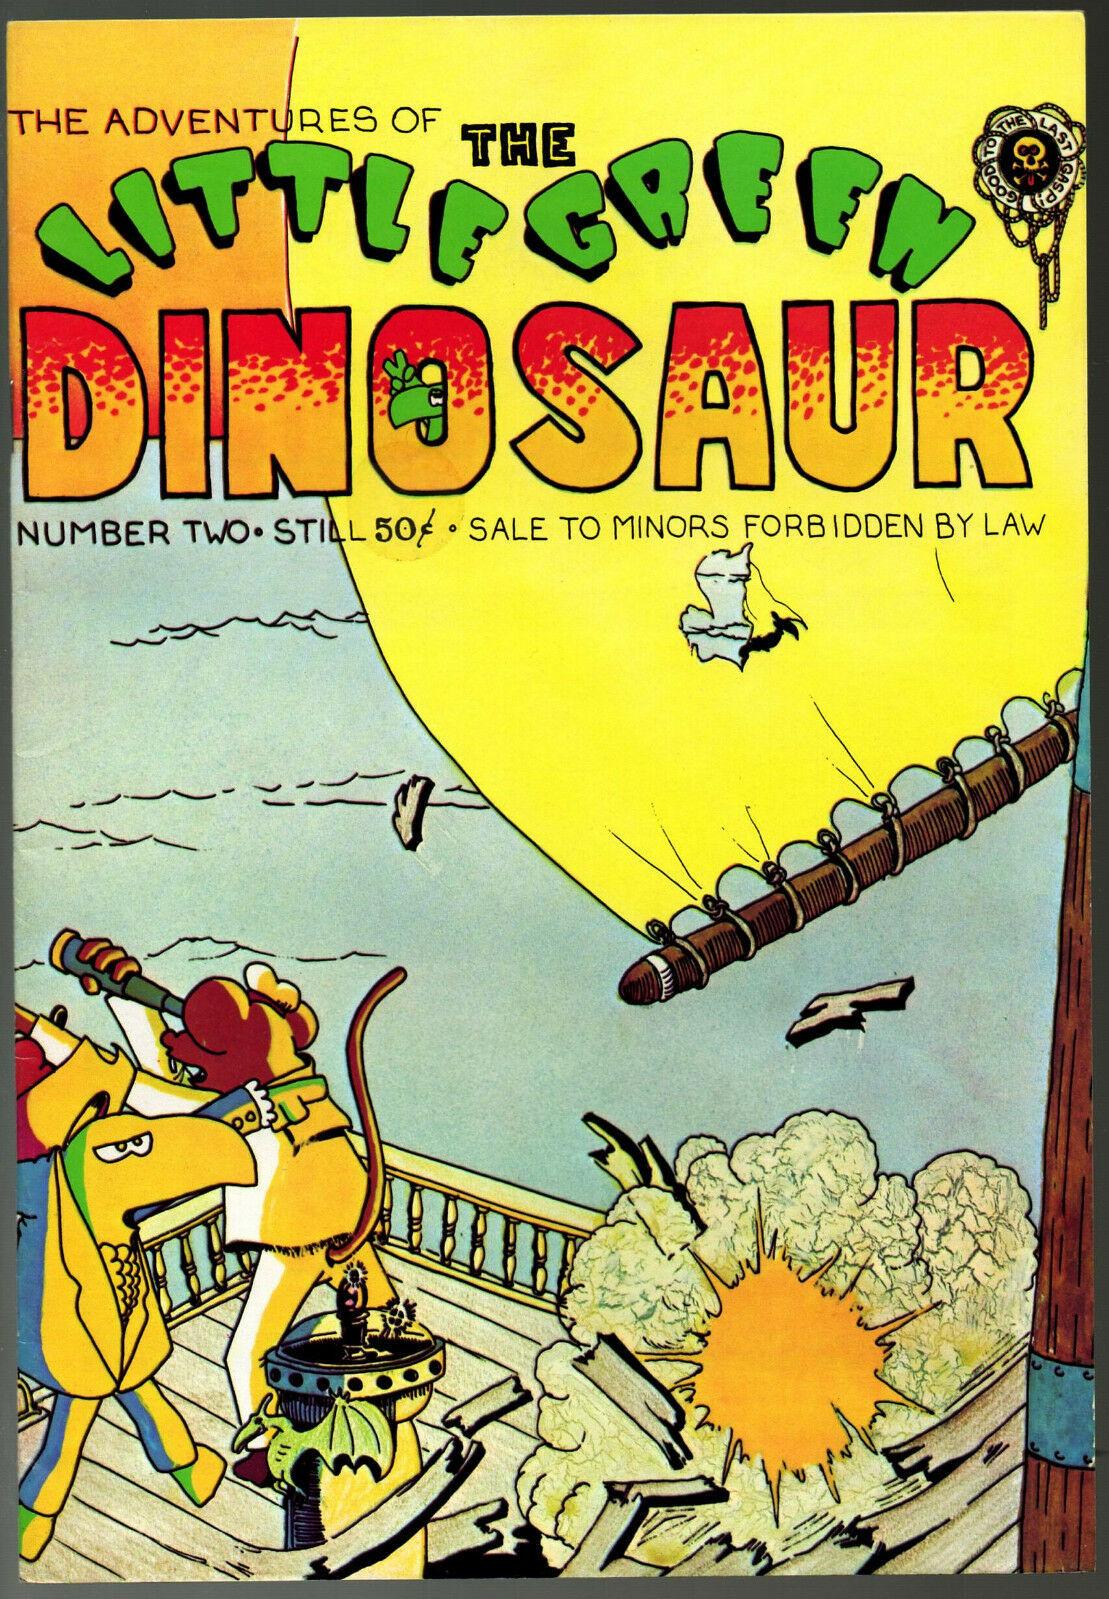 Little Green Dinosaur #1 & 2, Last Gasp, 1972-3  vintage Underground Comix.  - o